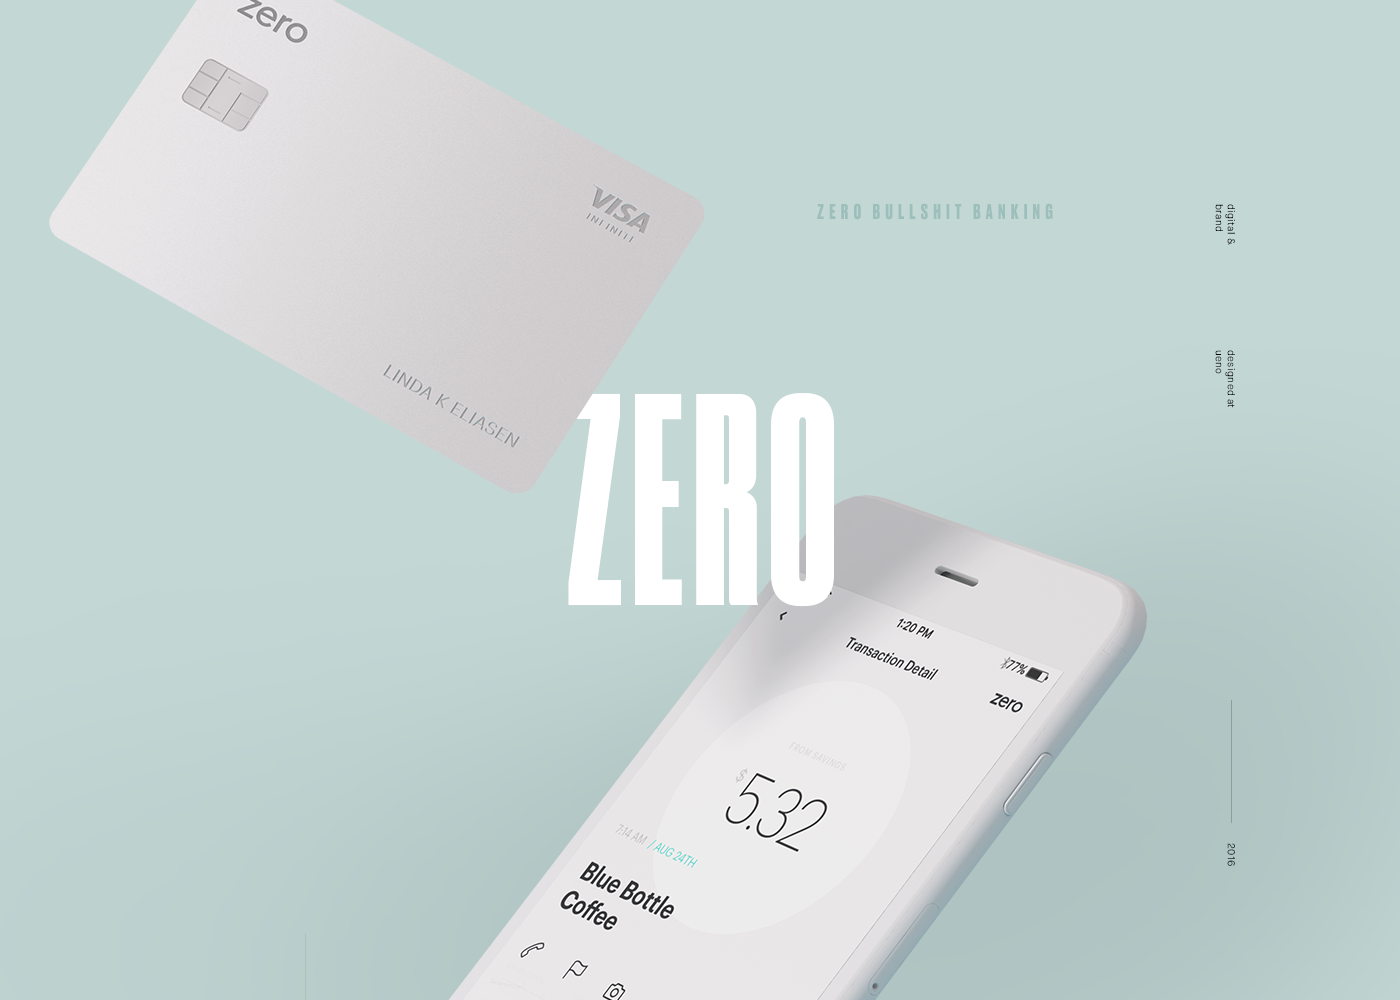 Zero Branding and Website on